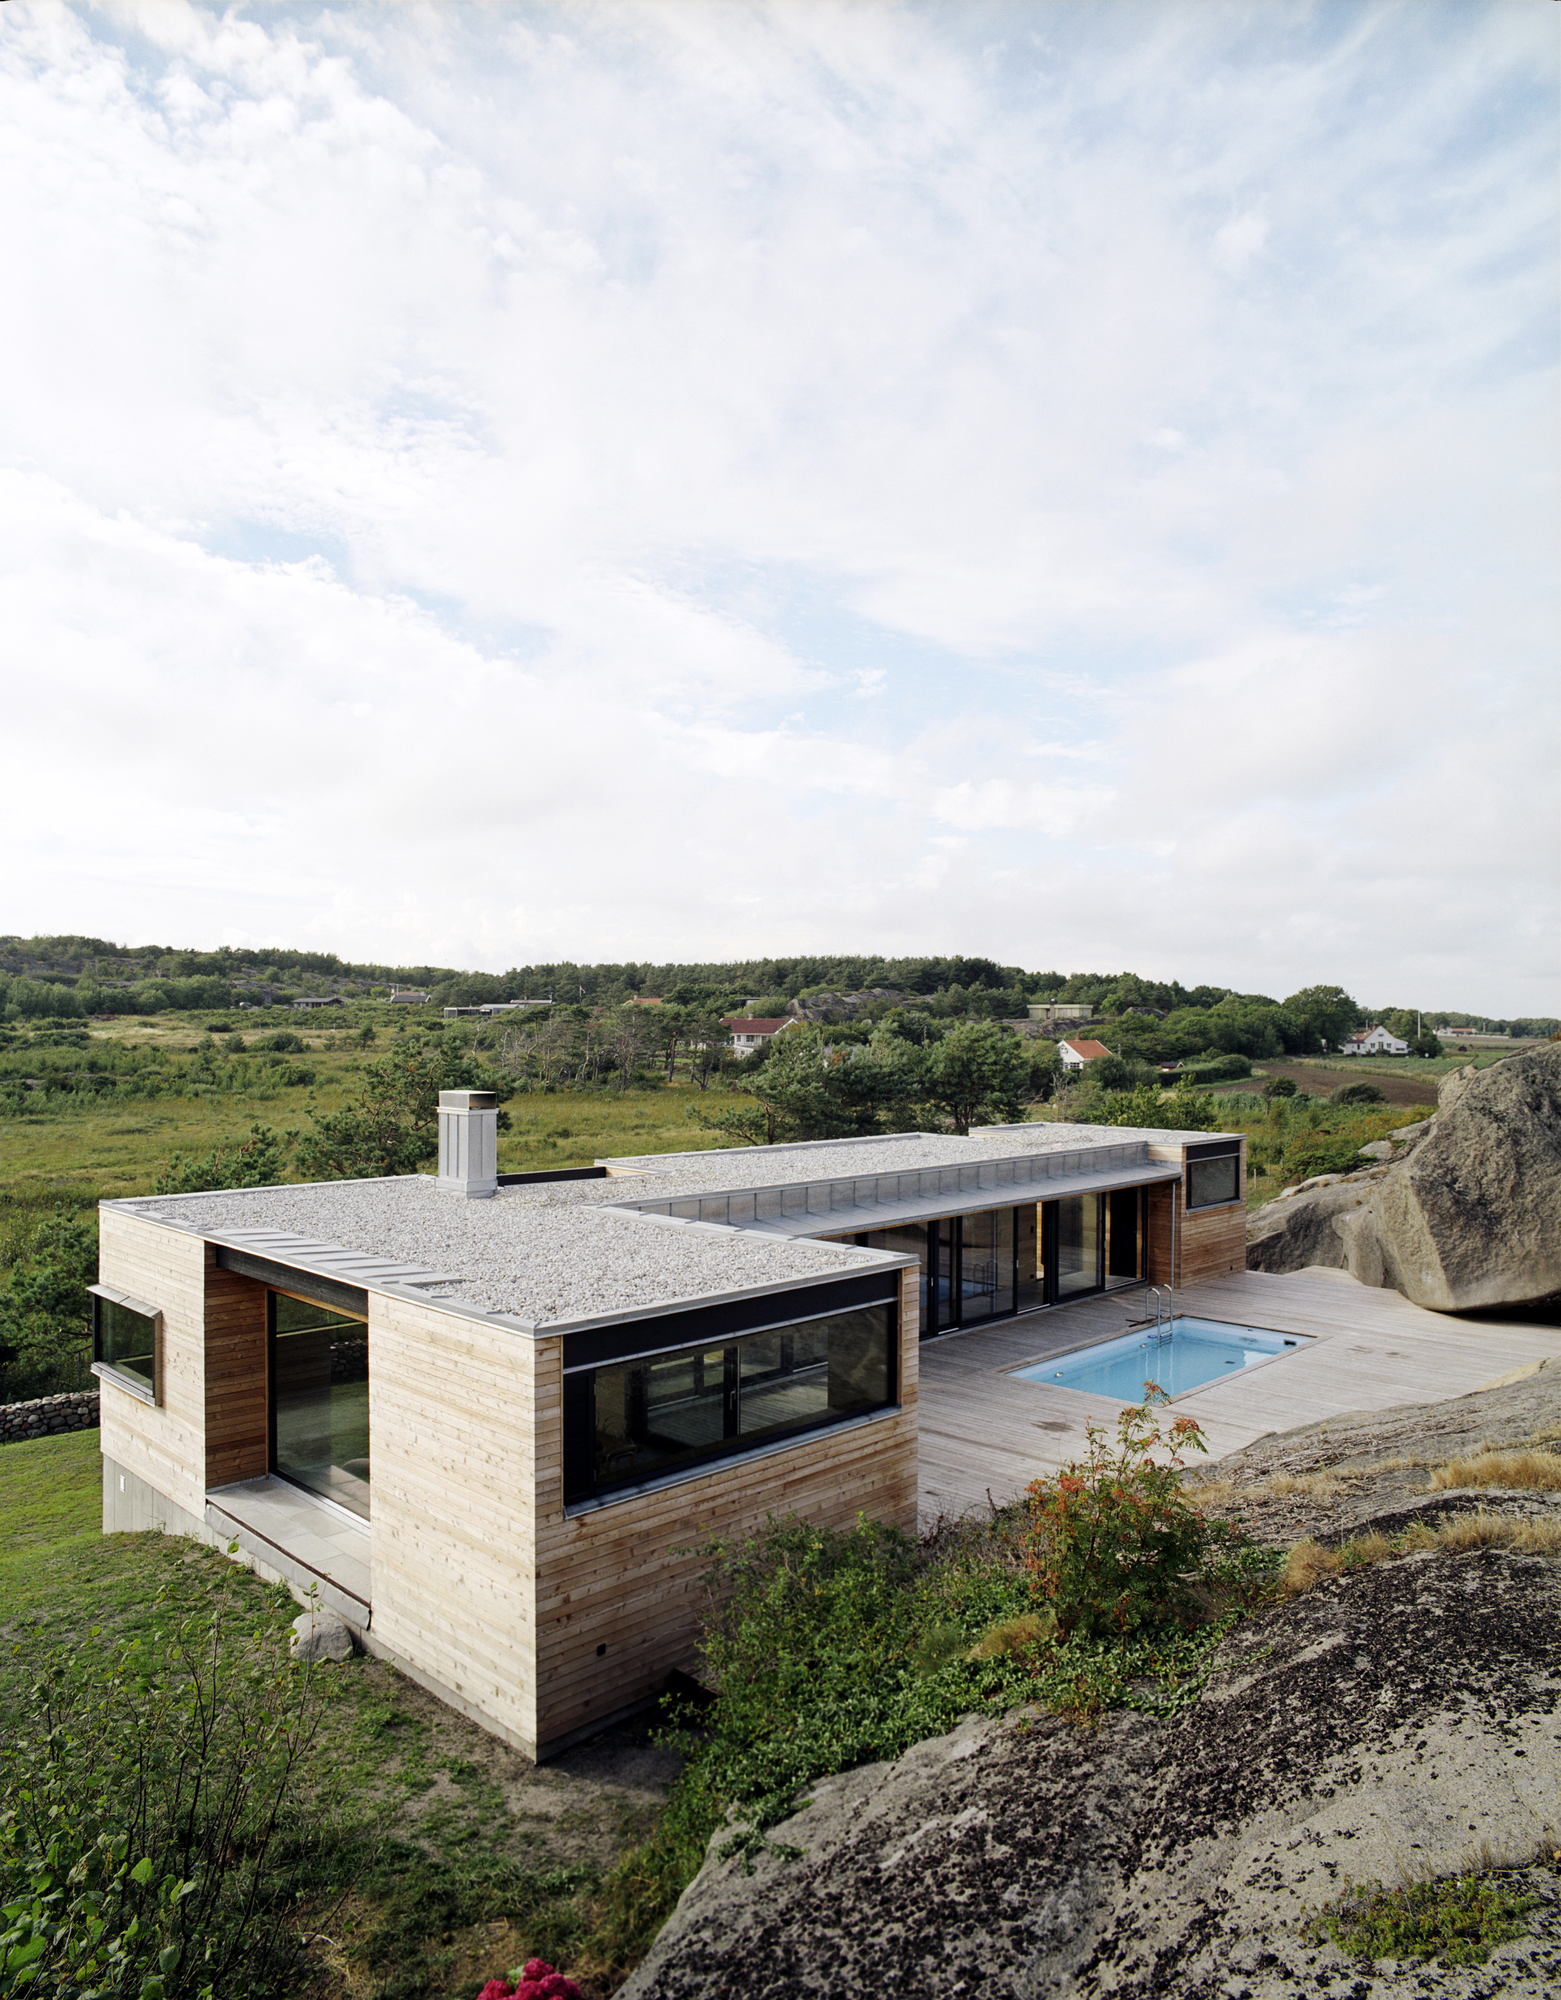 Summerhouse / Marianne Borge + Kjetil Saeterdal, © Ivan Brodey